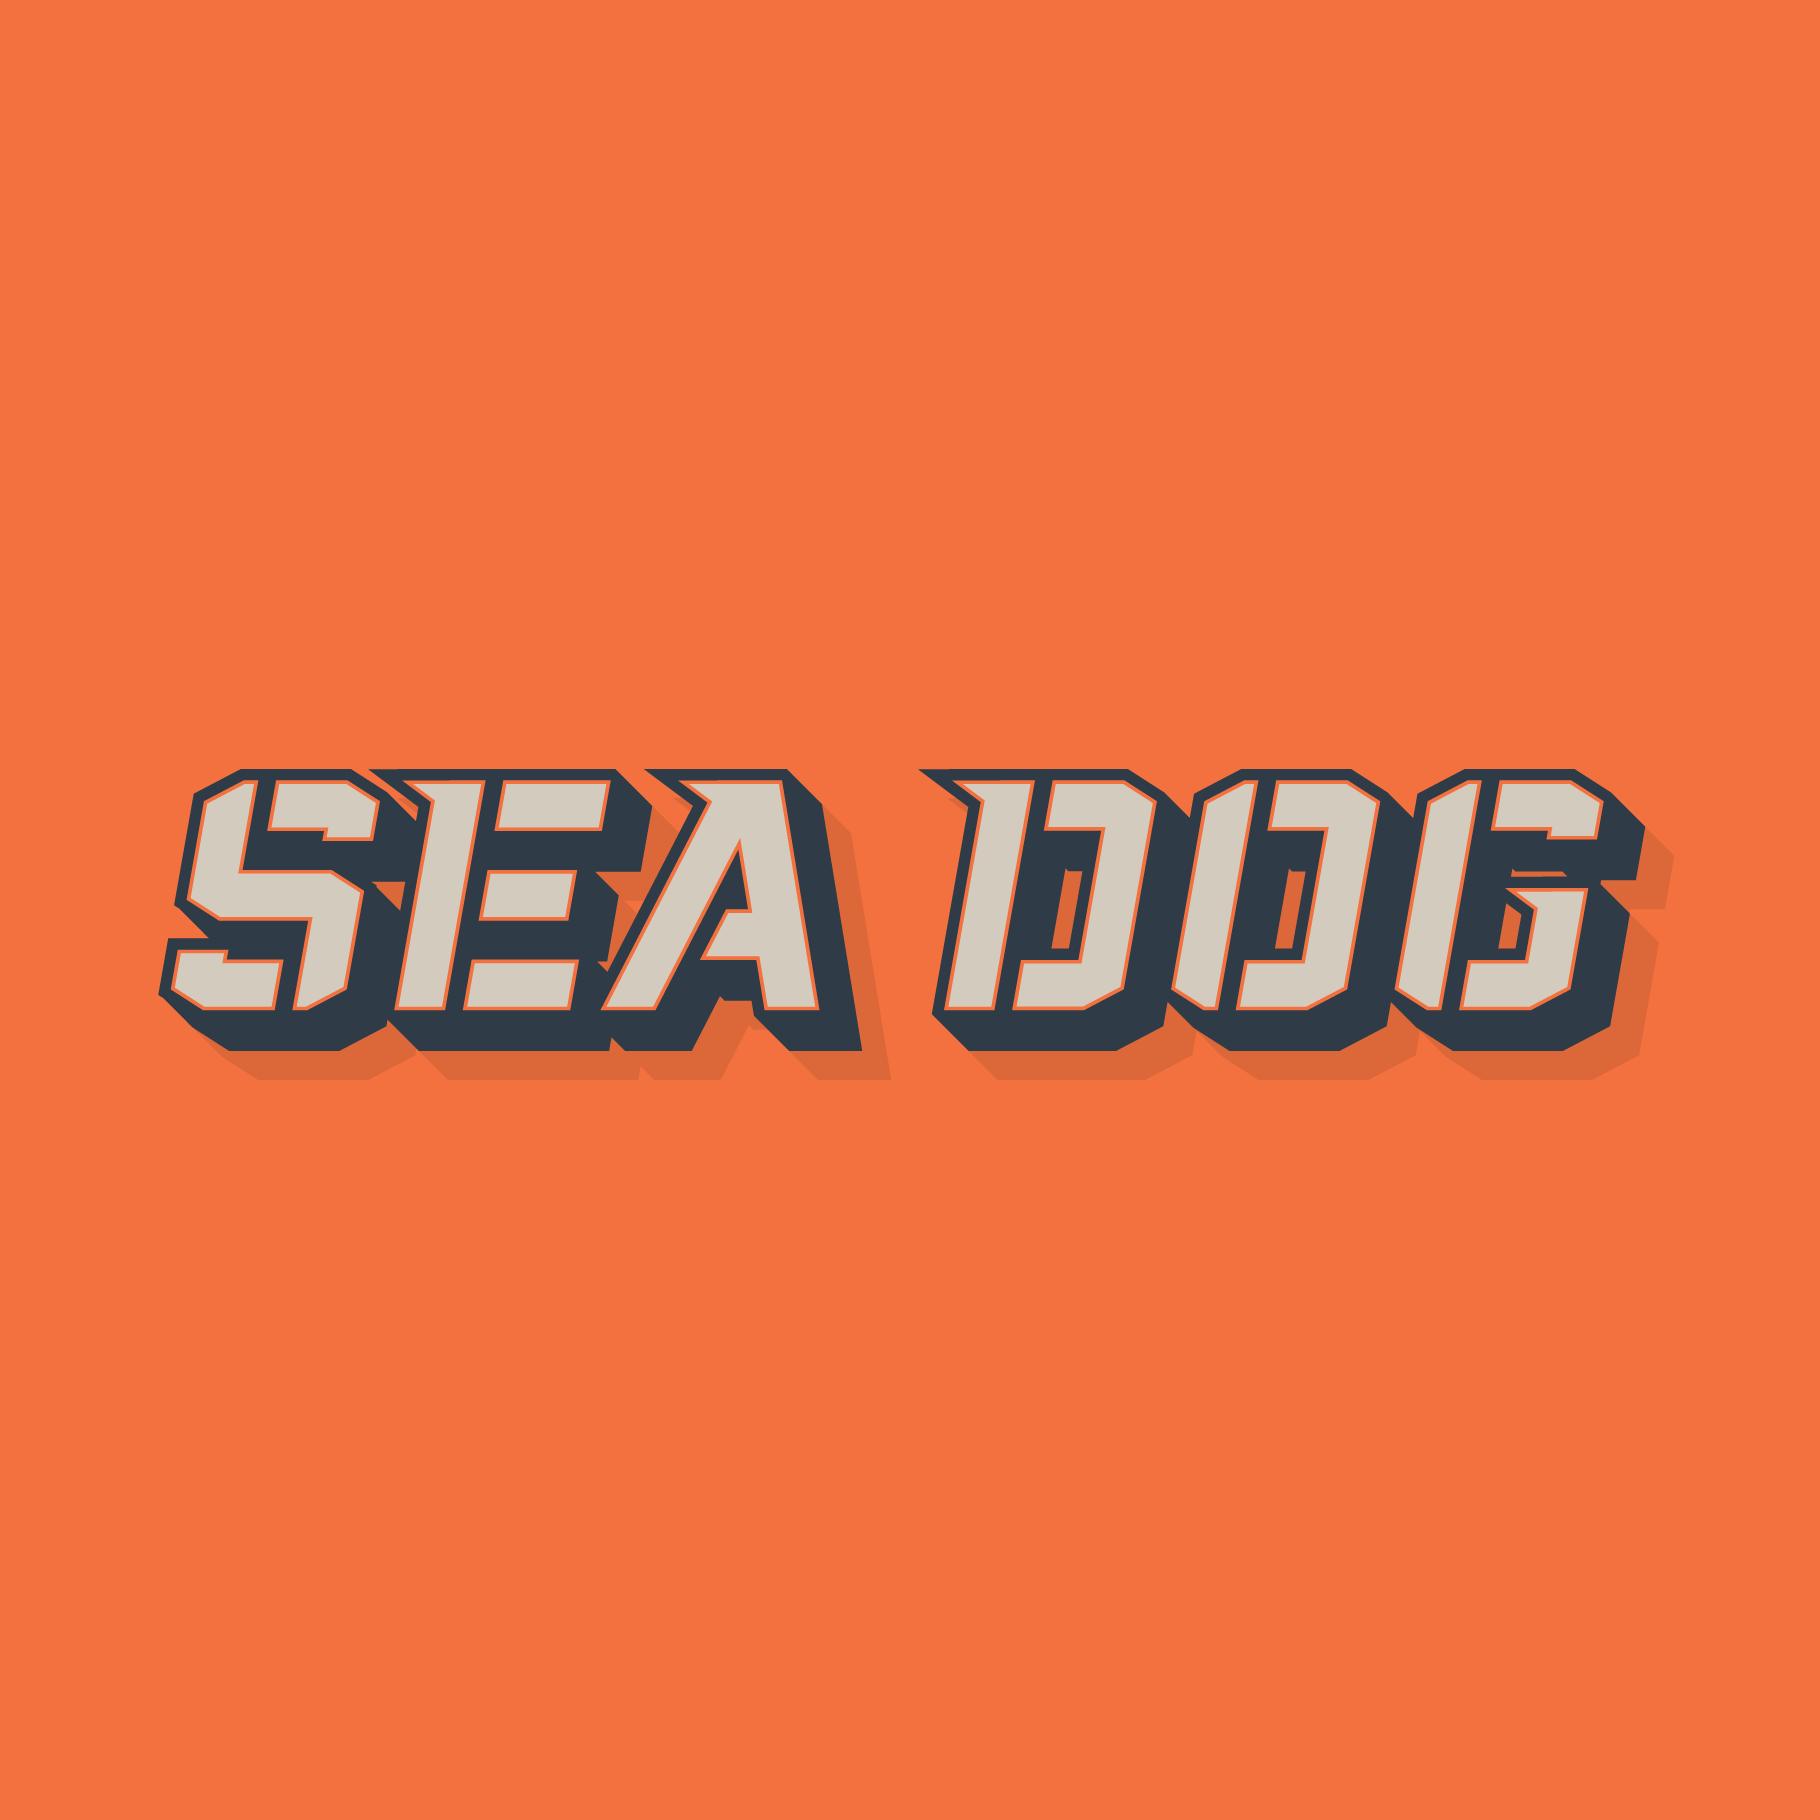 Sea Dog - Display Typeface